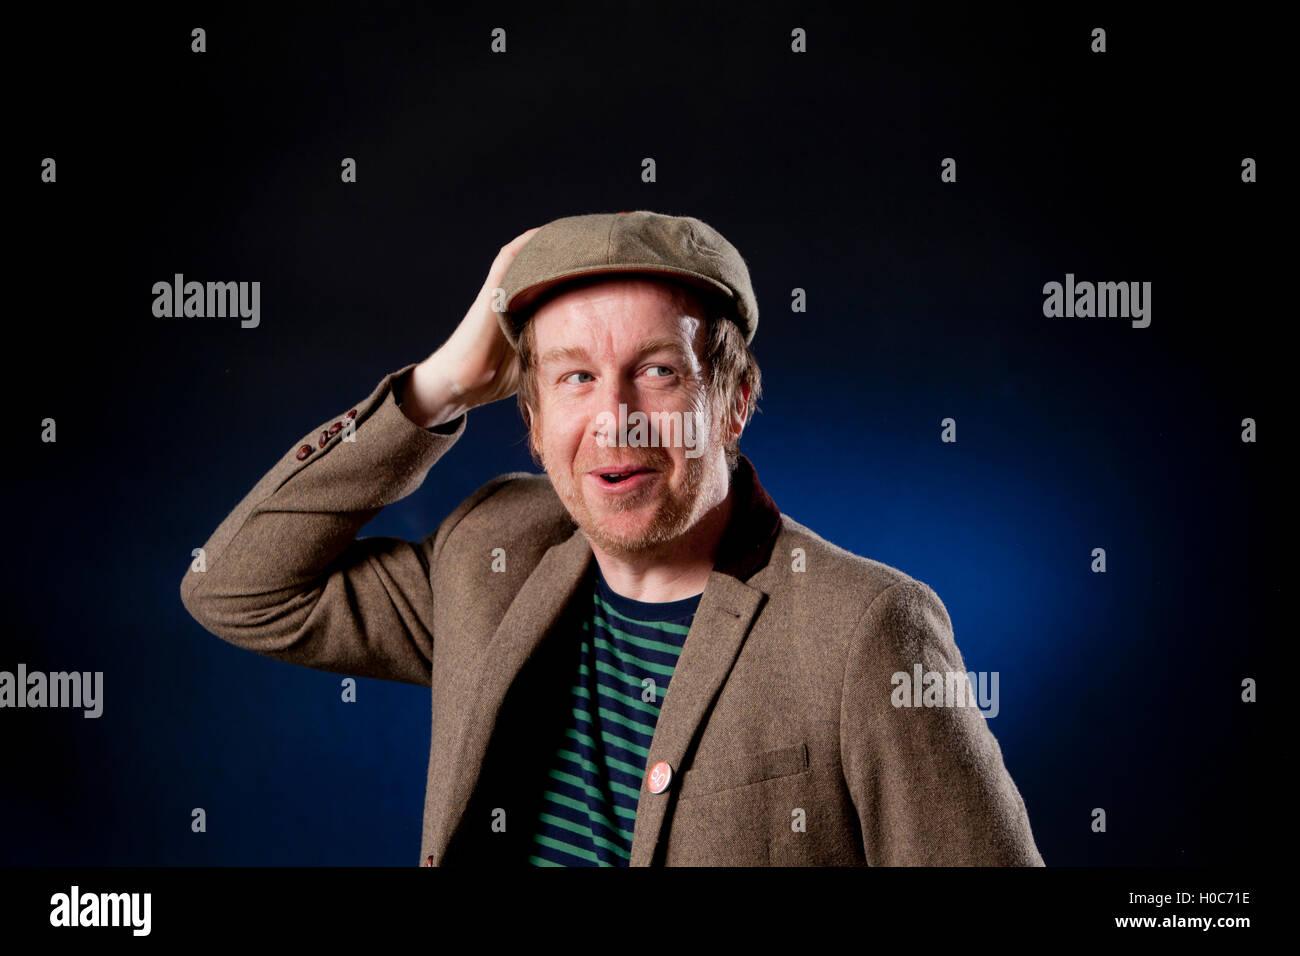 Kevin Barry, the Irish novelist and short-story writer, at the Edinburgh International Book Festival. Edinburgh, - Stock Image